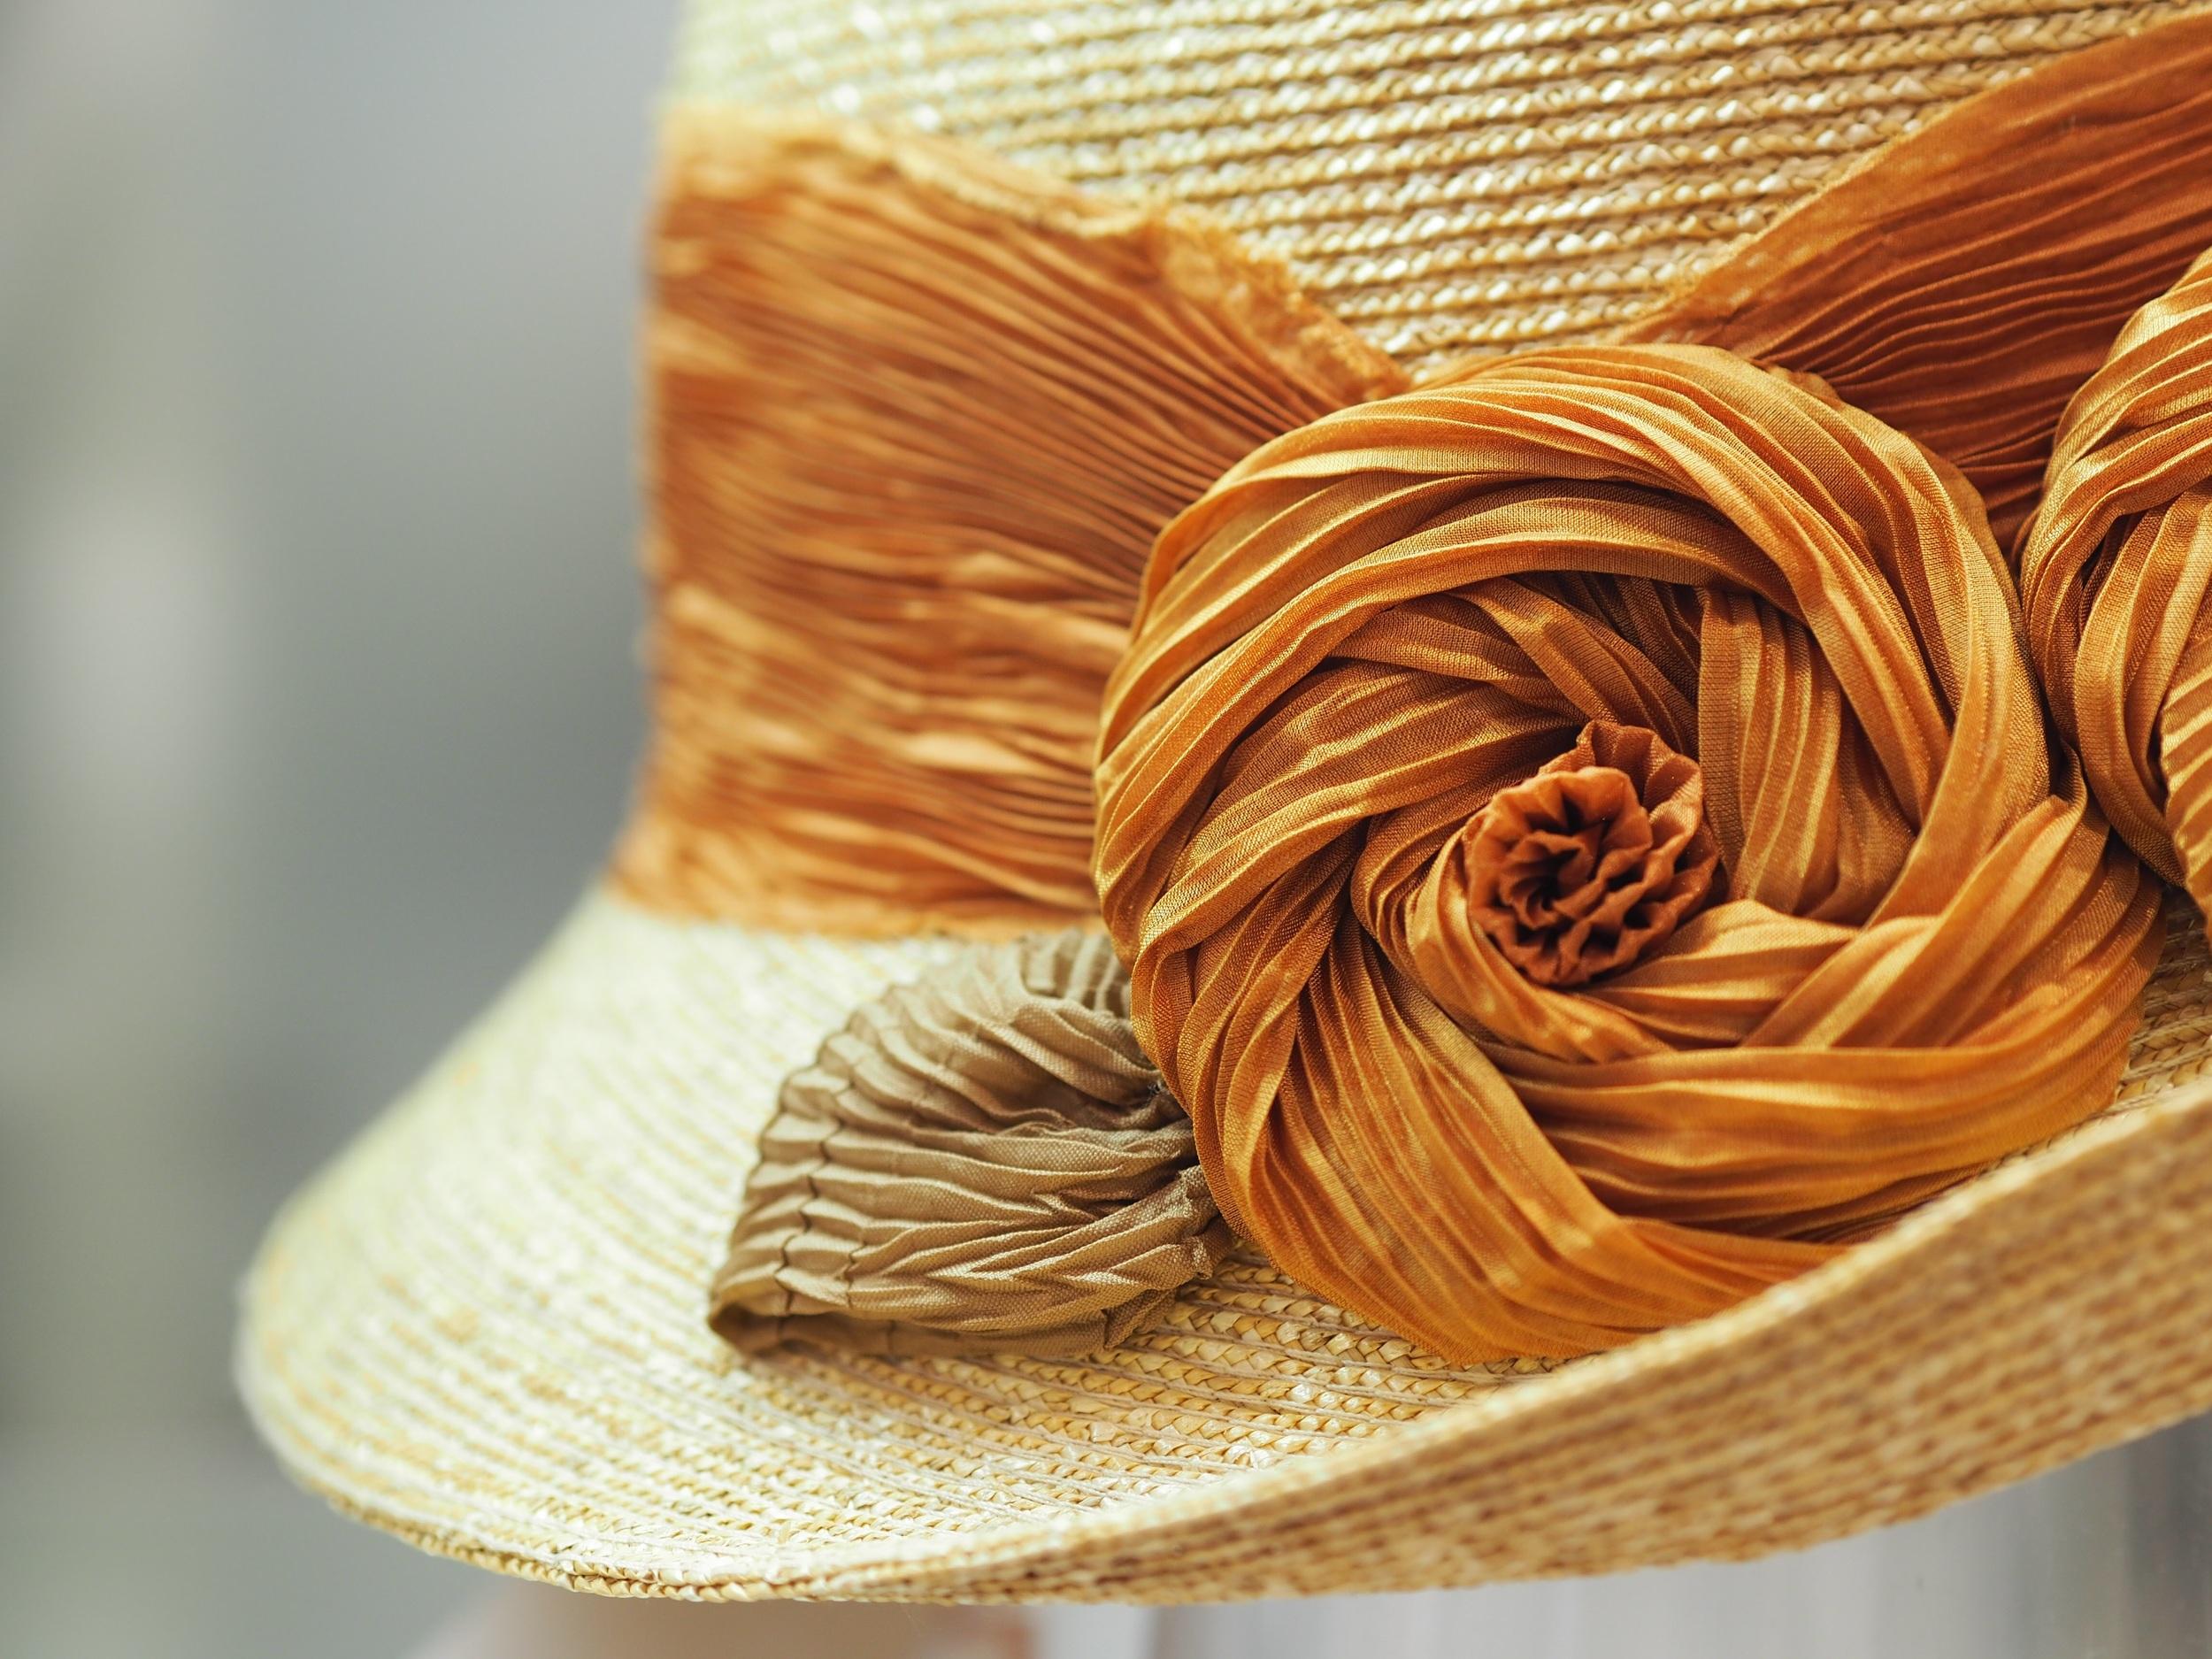 Italian cliche laichow straw and ahi or flower $550